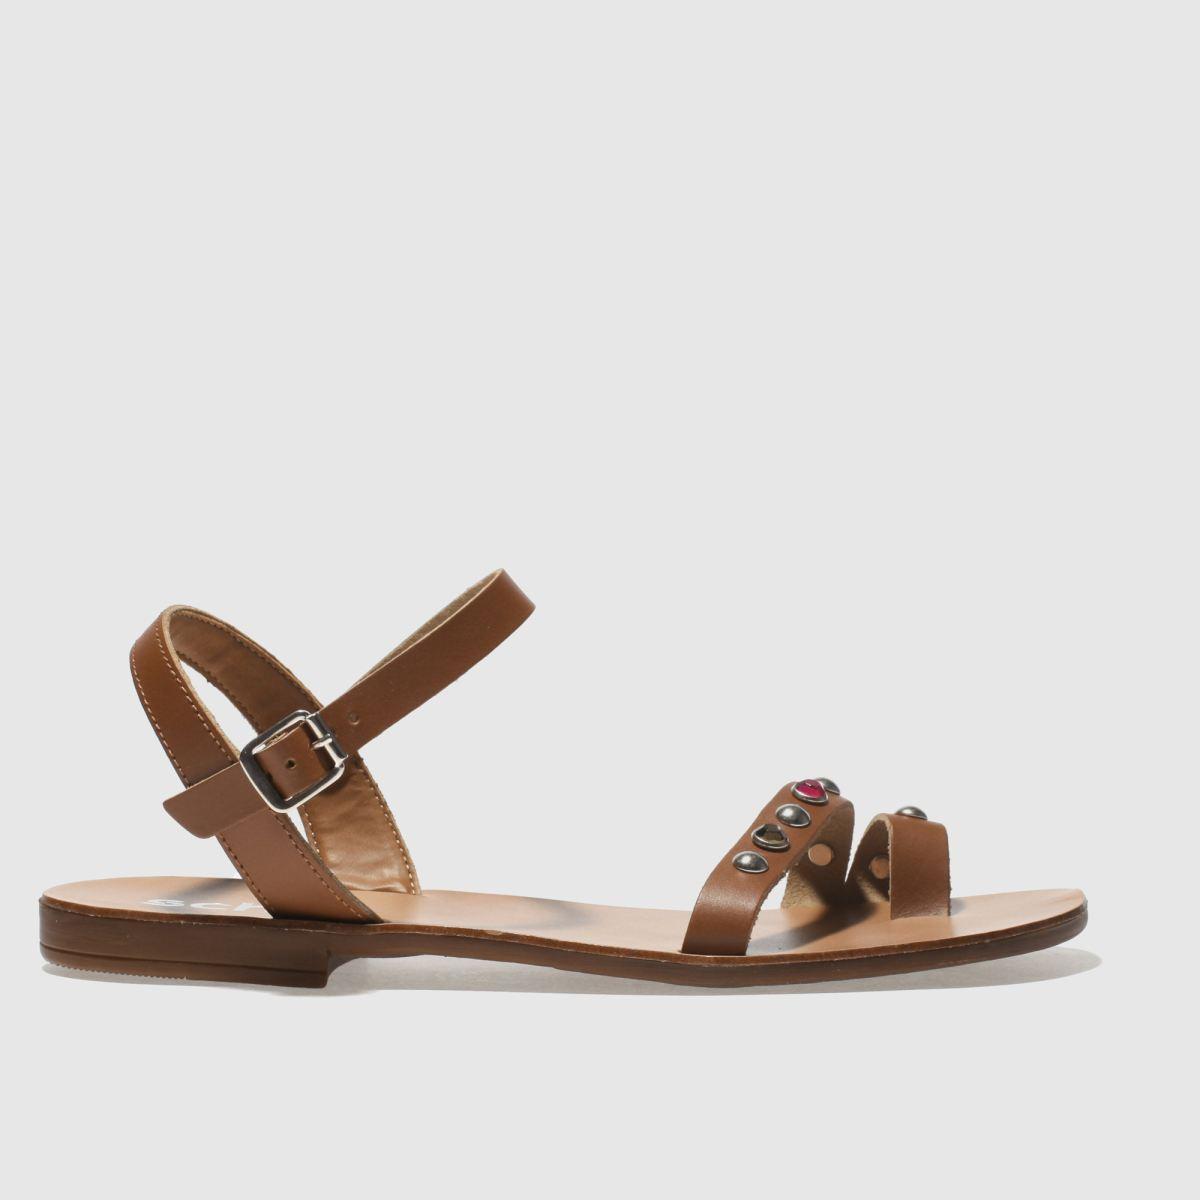 schuh Schuh Tan Cannes Sandals